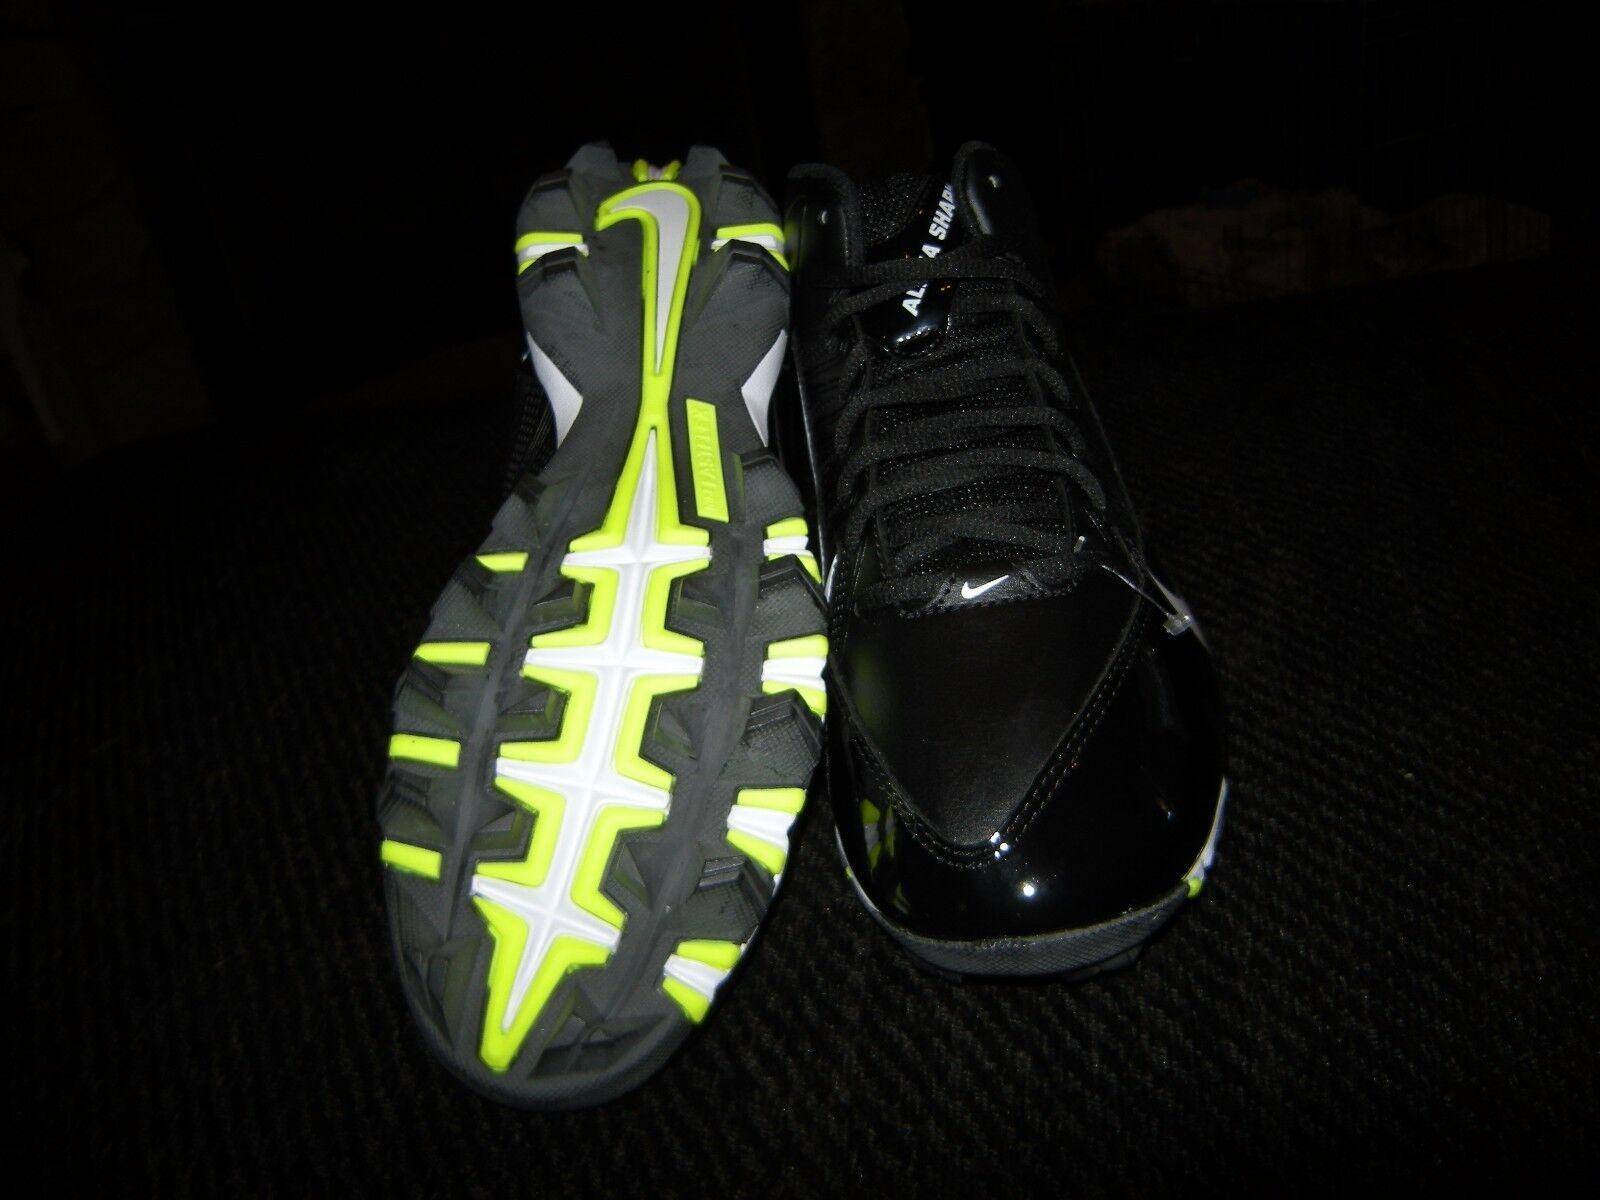 online store c7fc2 727dd ... Brand New Hombre Negro Negro Negro   Amarillo Nike Alpha Pro 3   4 d  Football